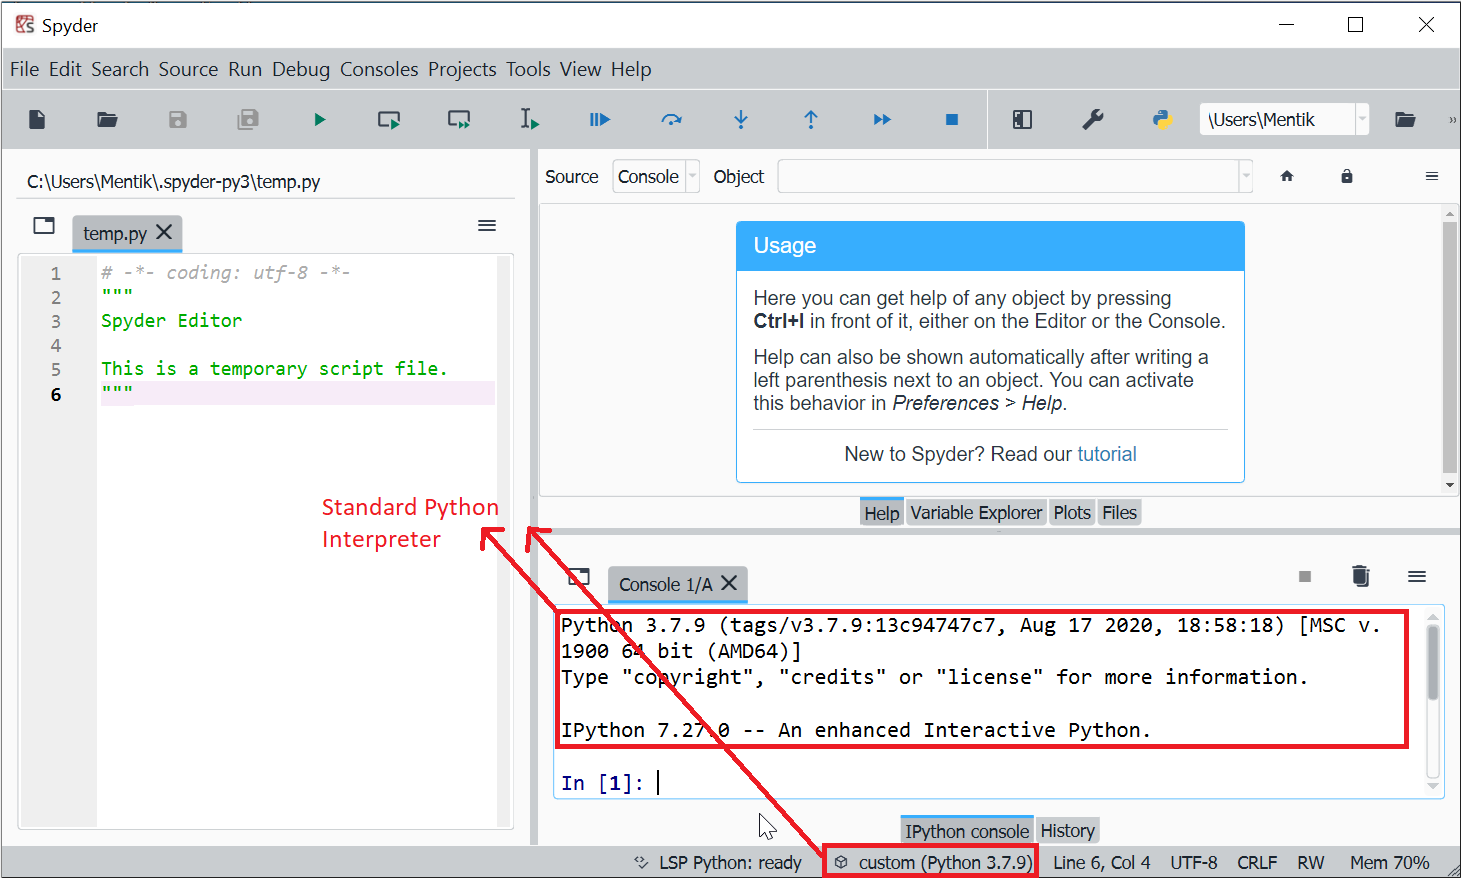 Ilustrasi Spyder dengan Interpreter Python Standard